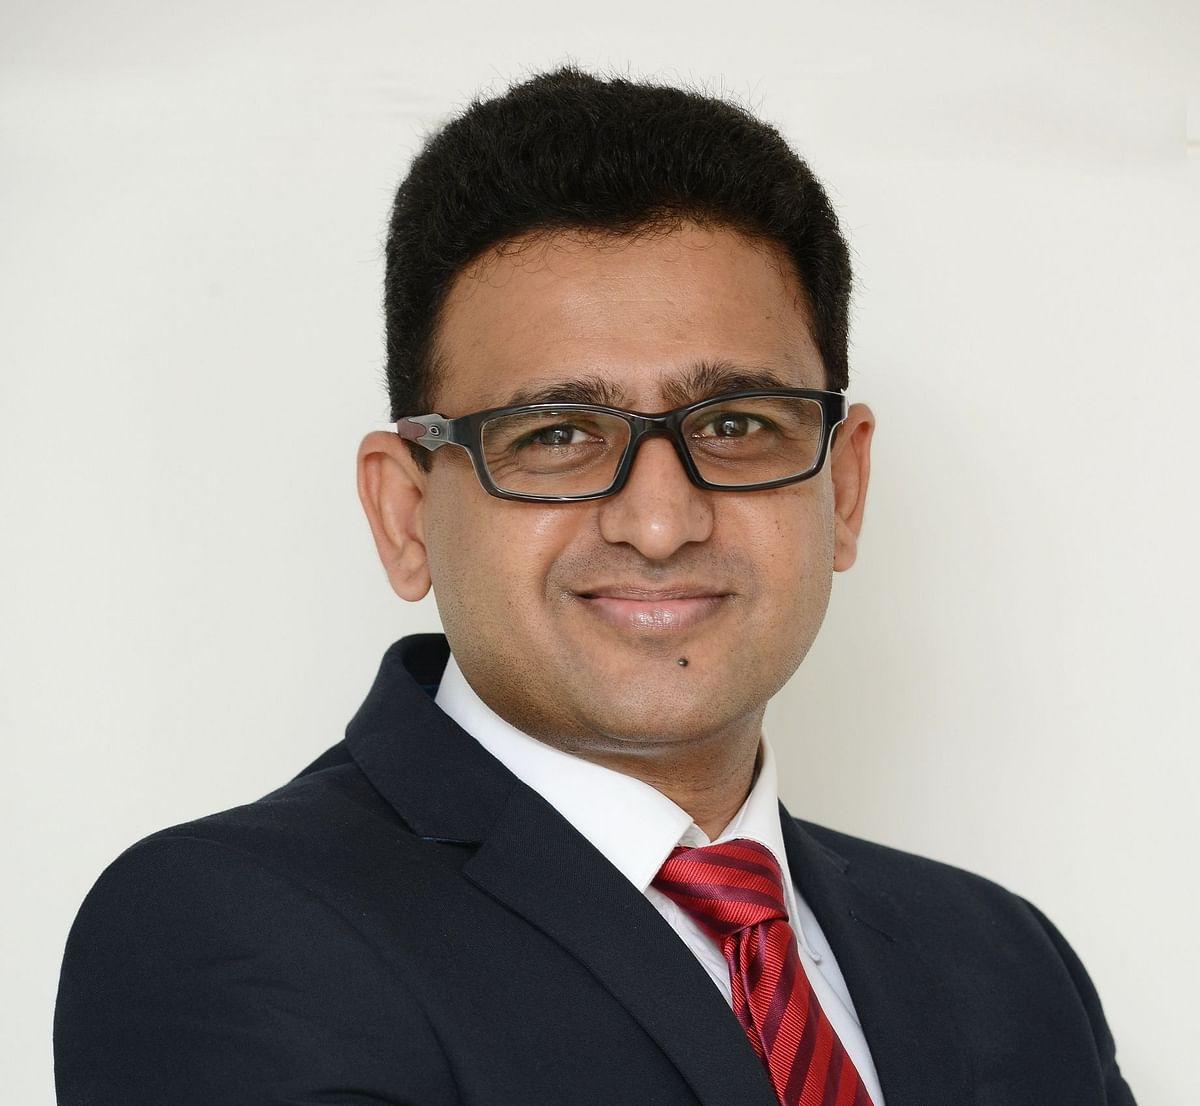 Vivek Srivasta